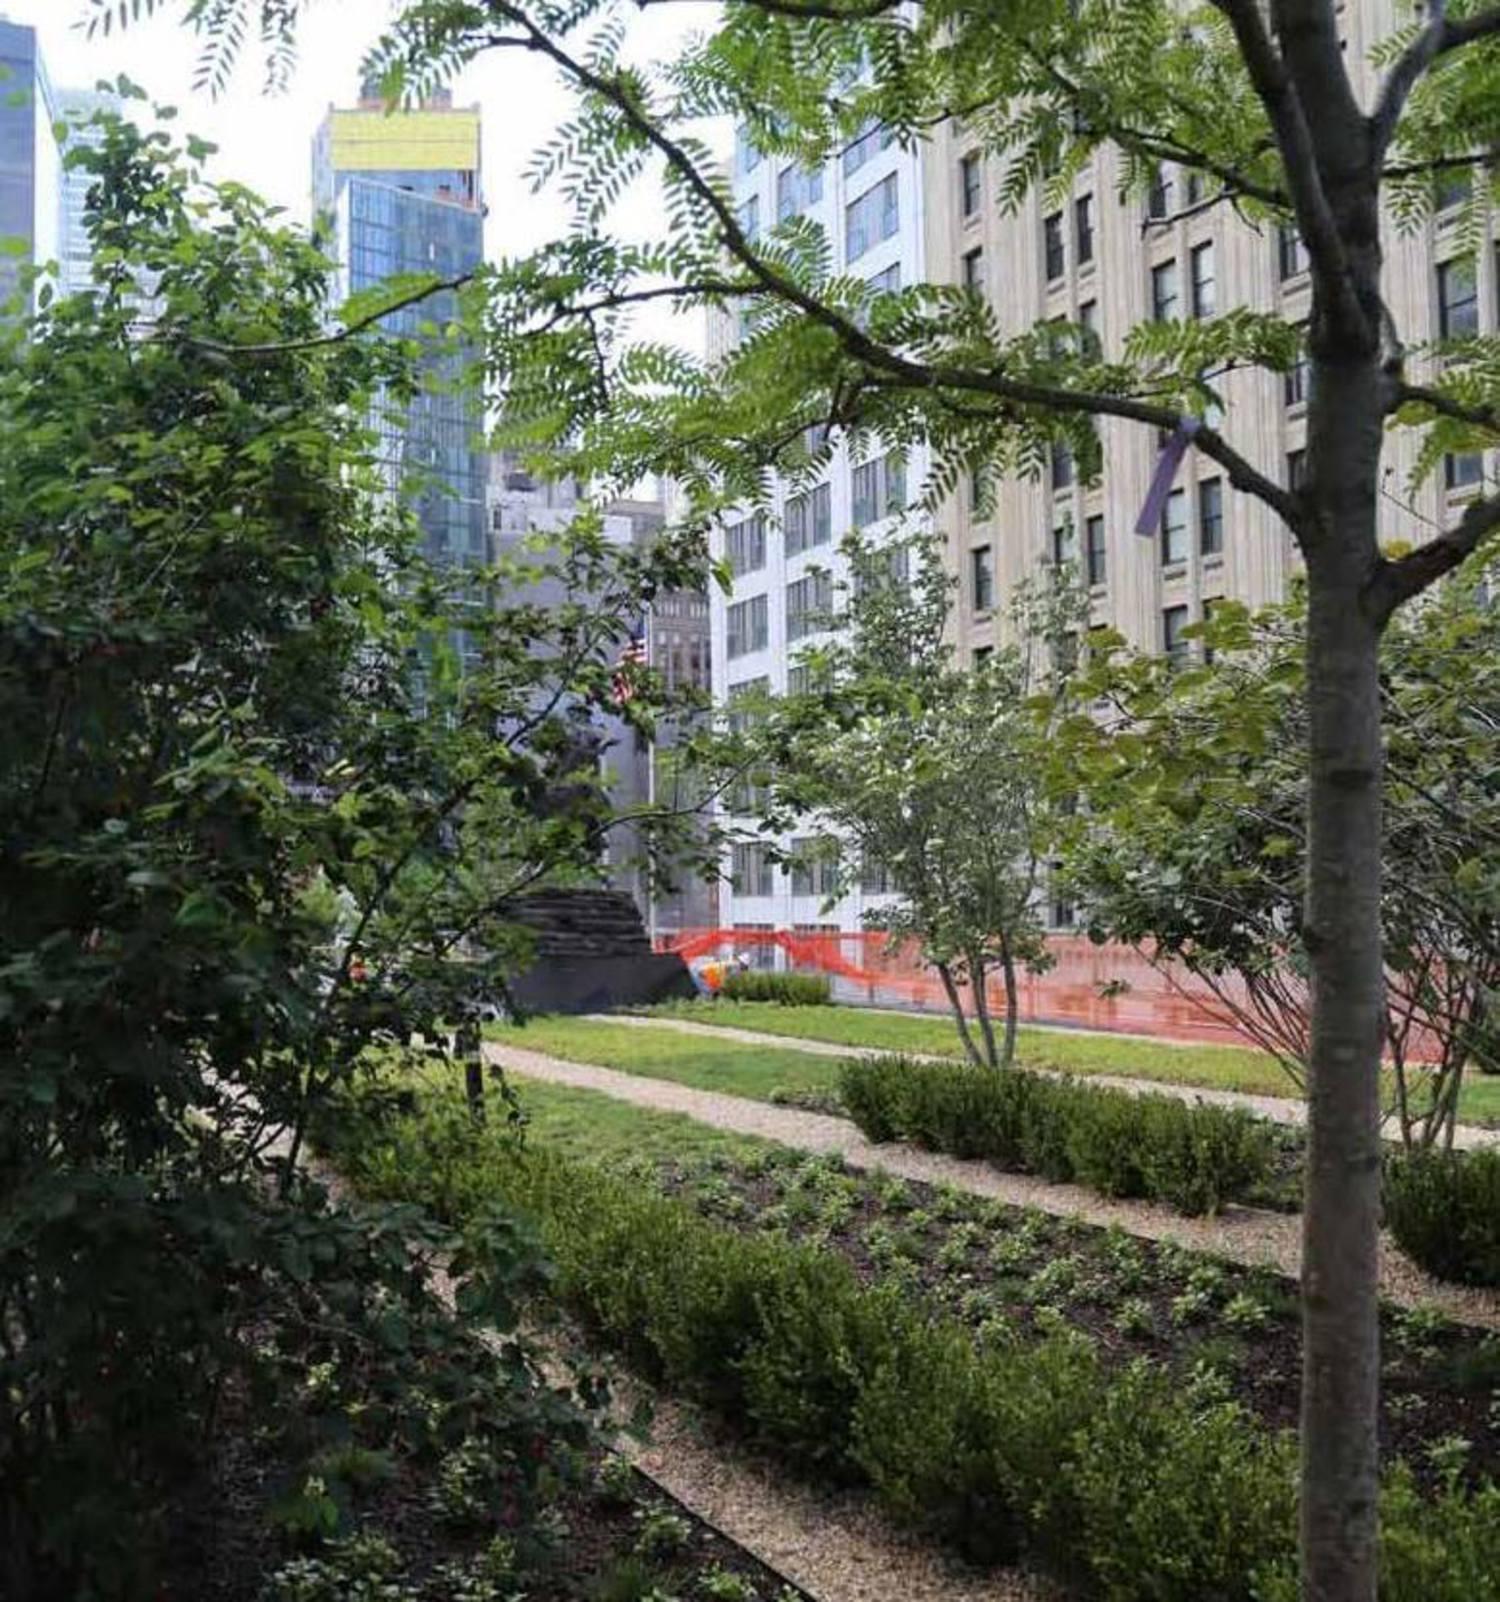 Planting continues at WTC Liberty Park